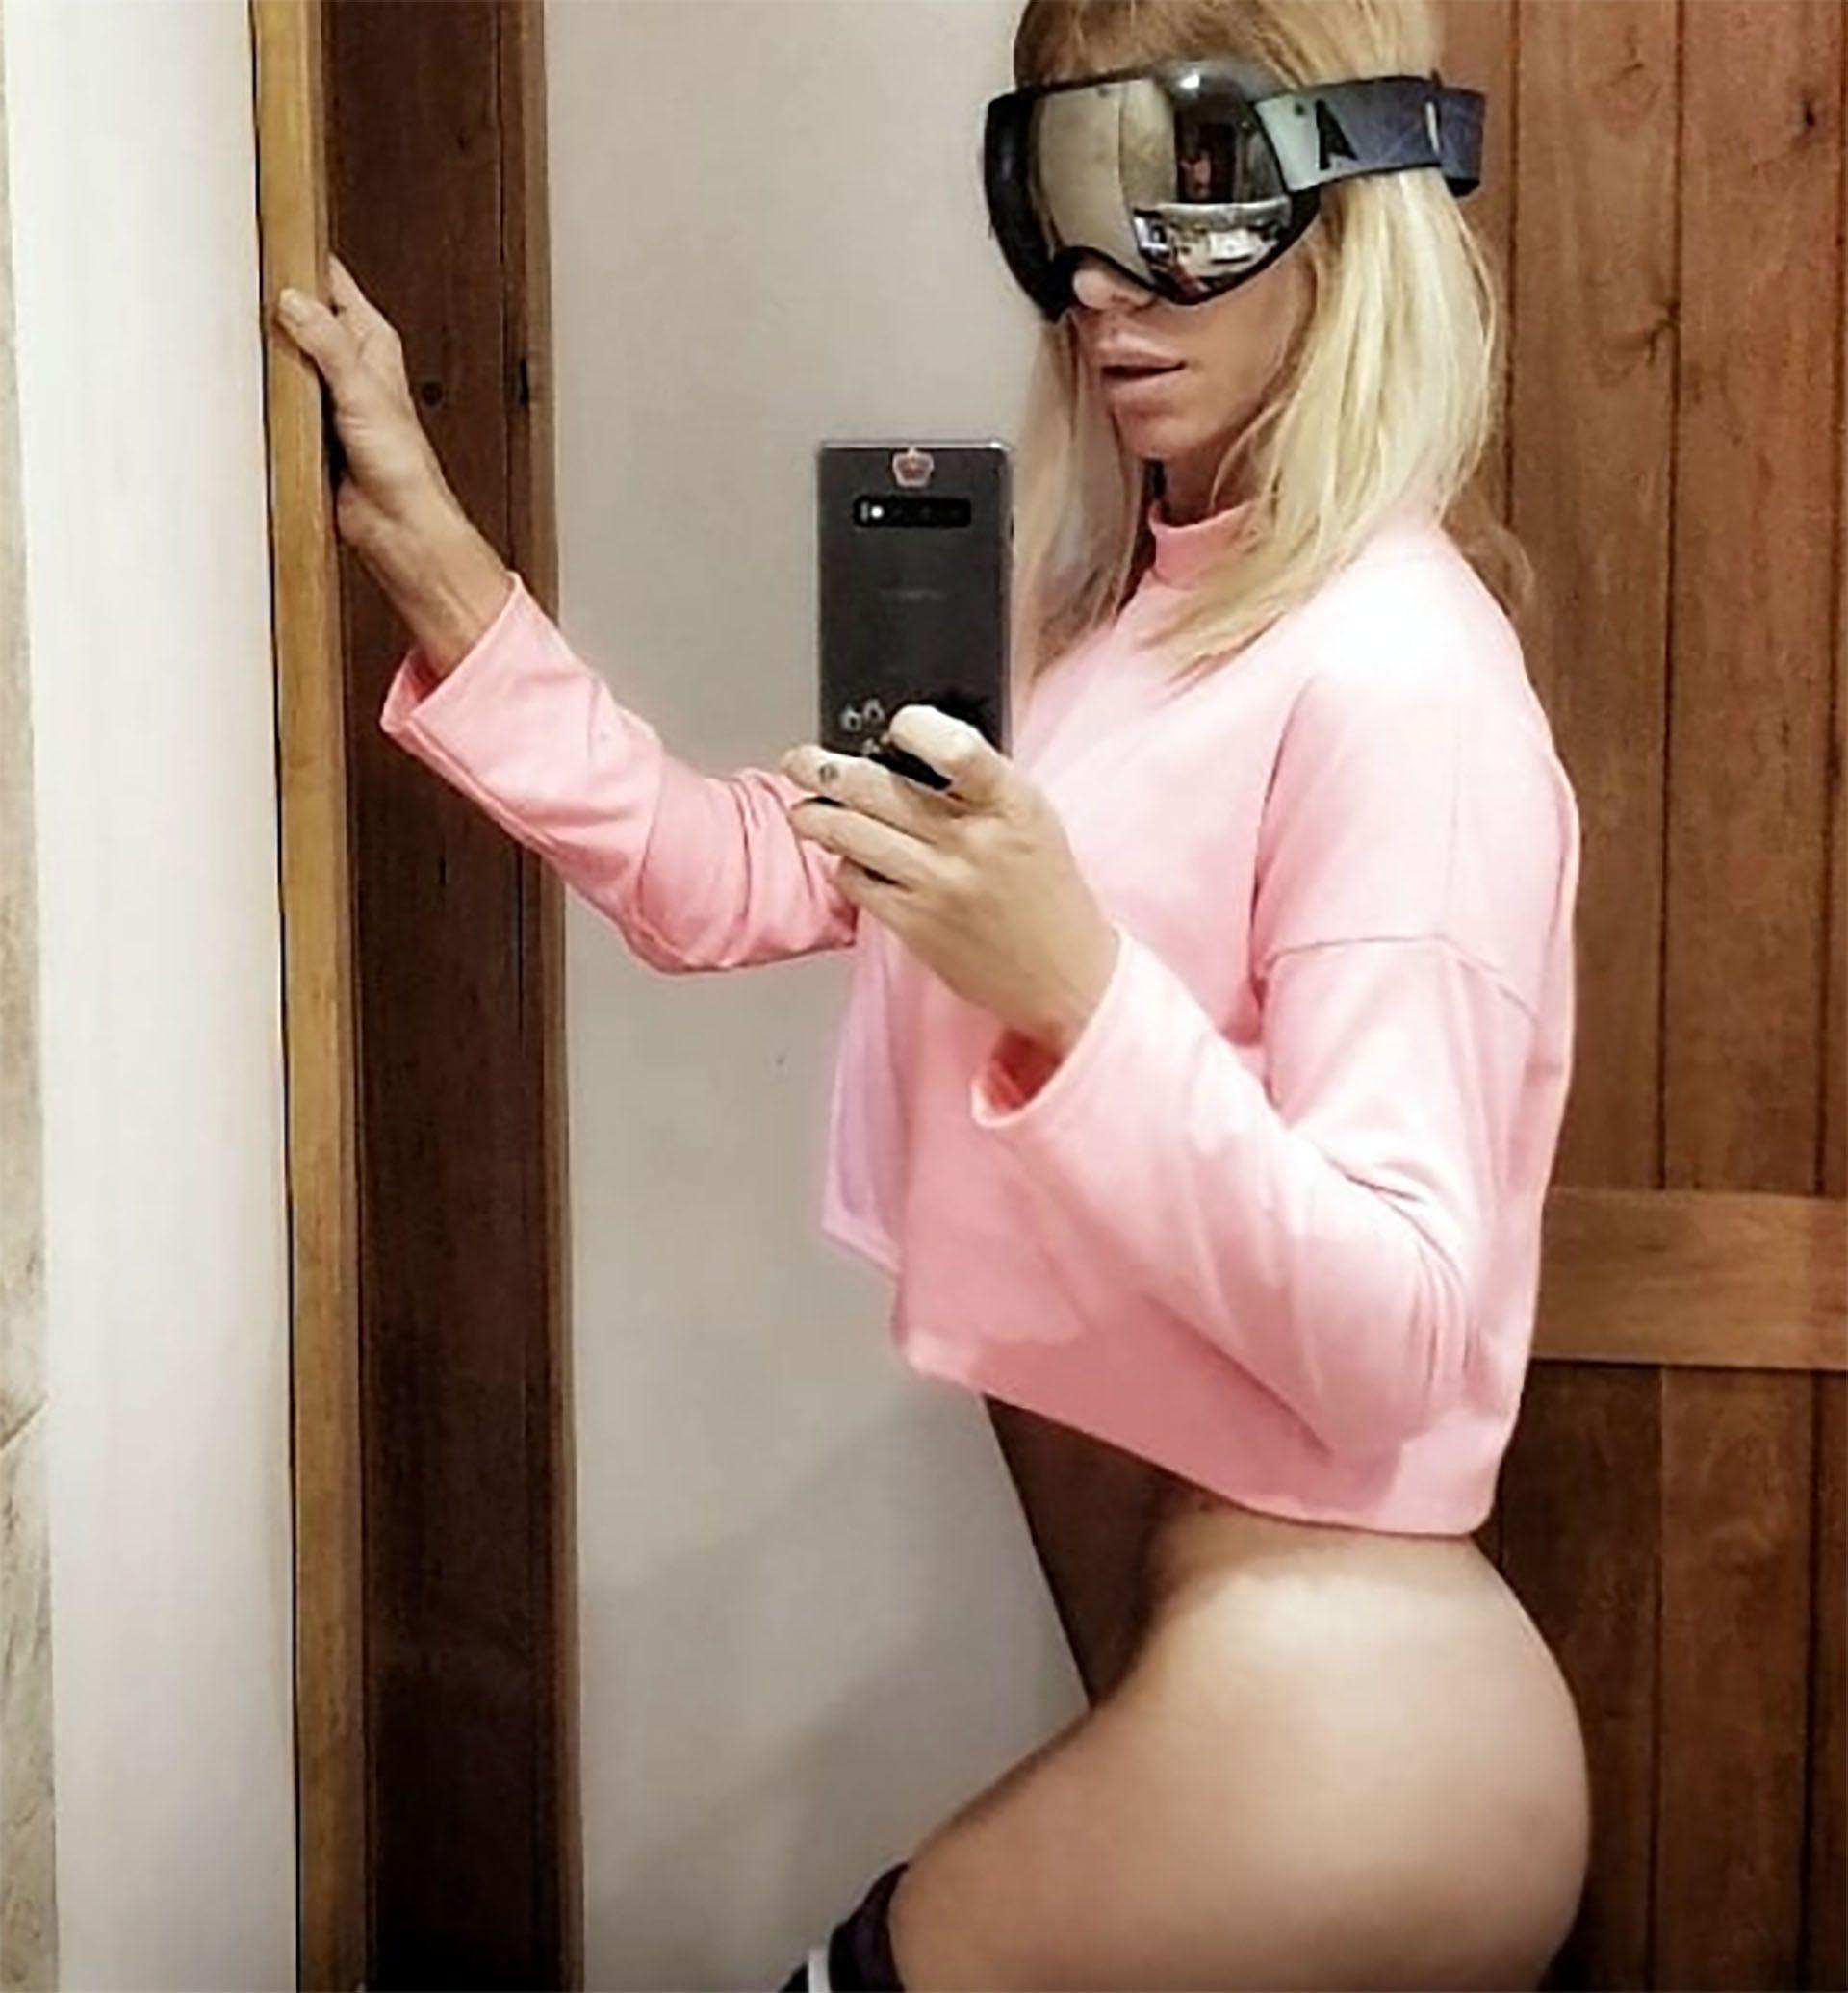 La selfie sensual de Nicole (Instagram)